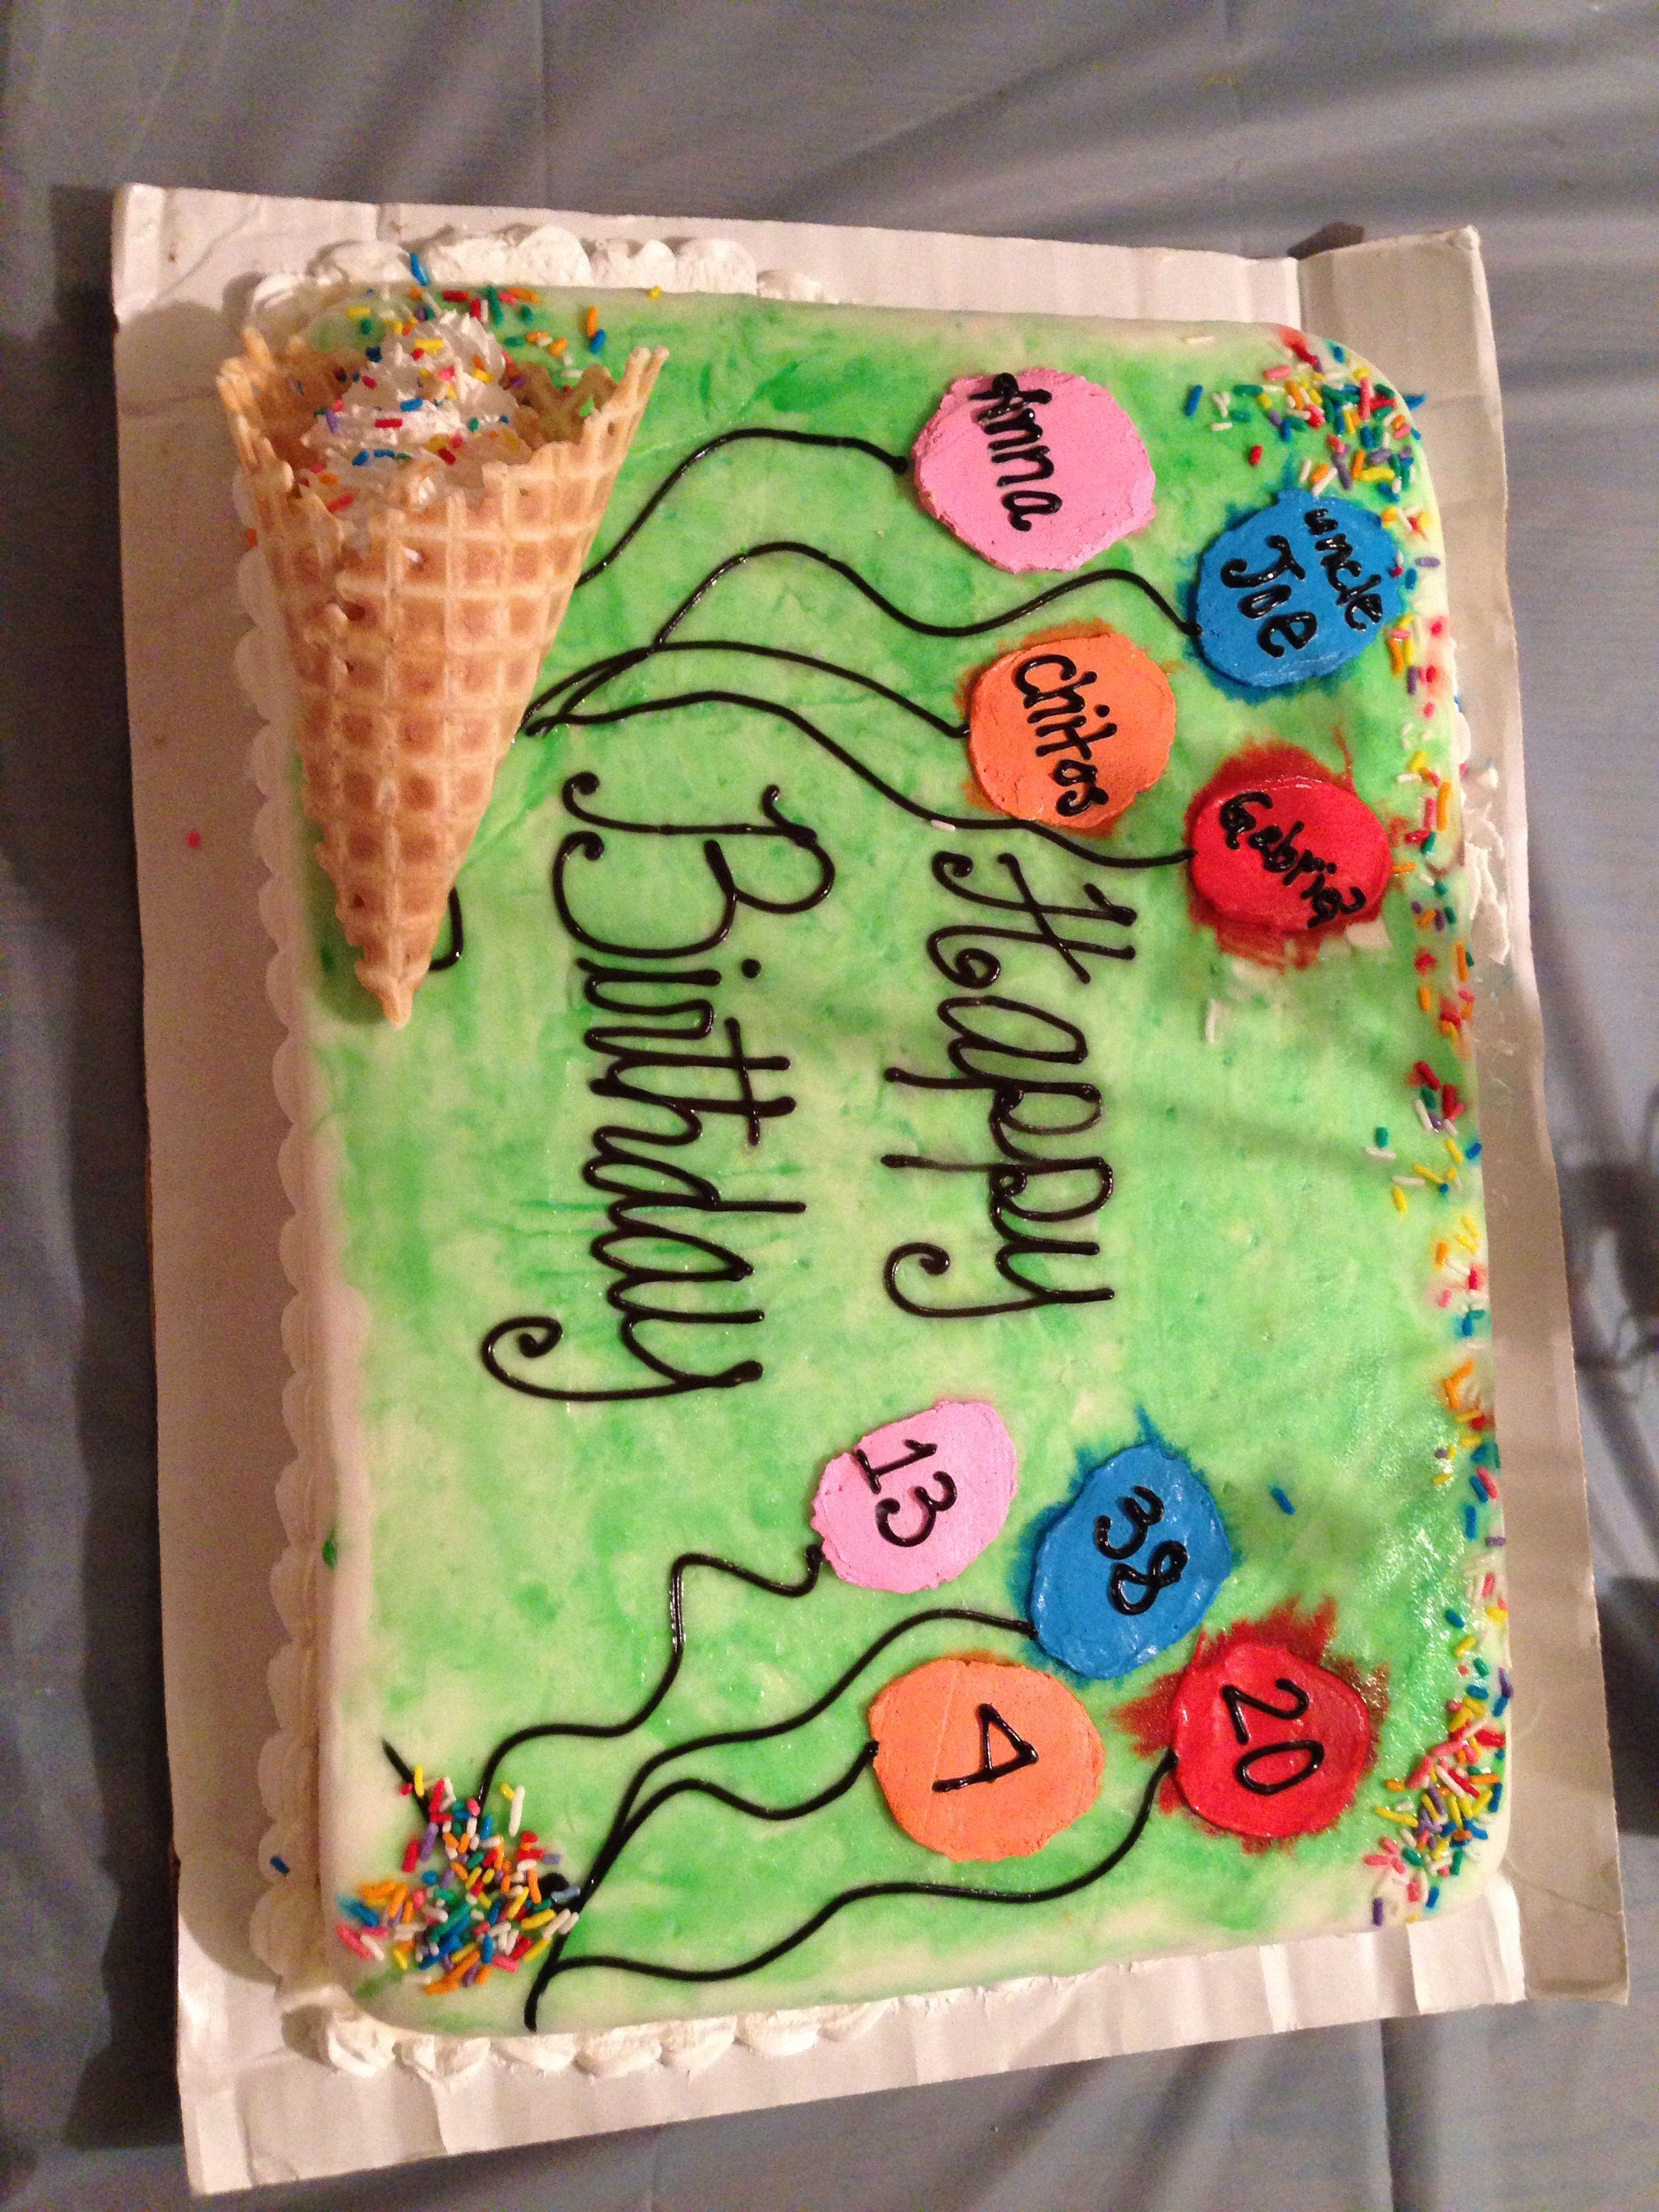 Sensational Multiple People Birthday Cake Birthday Sheet Cakes Birthday Funny Birthday Cards Online Hendilapandamsfinfo